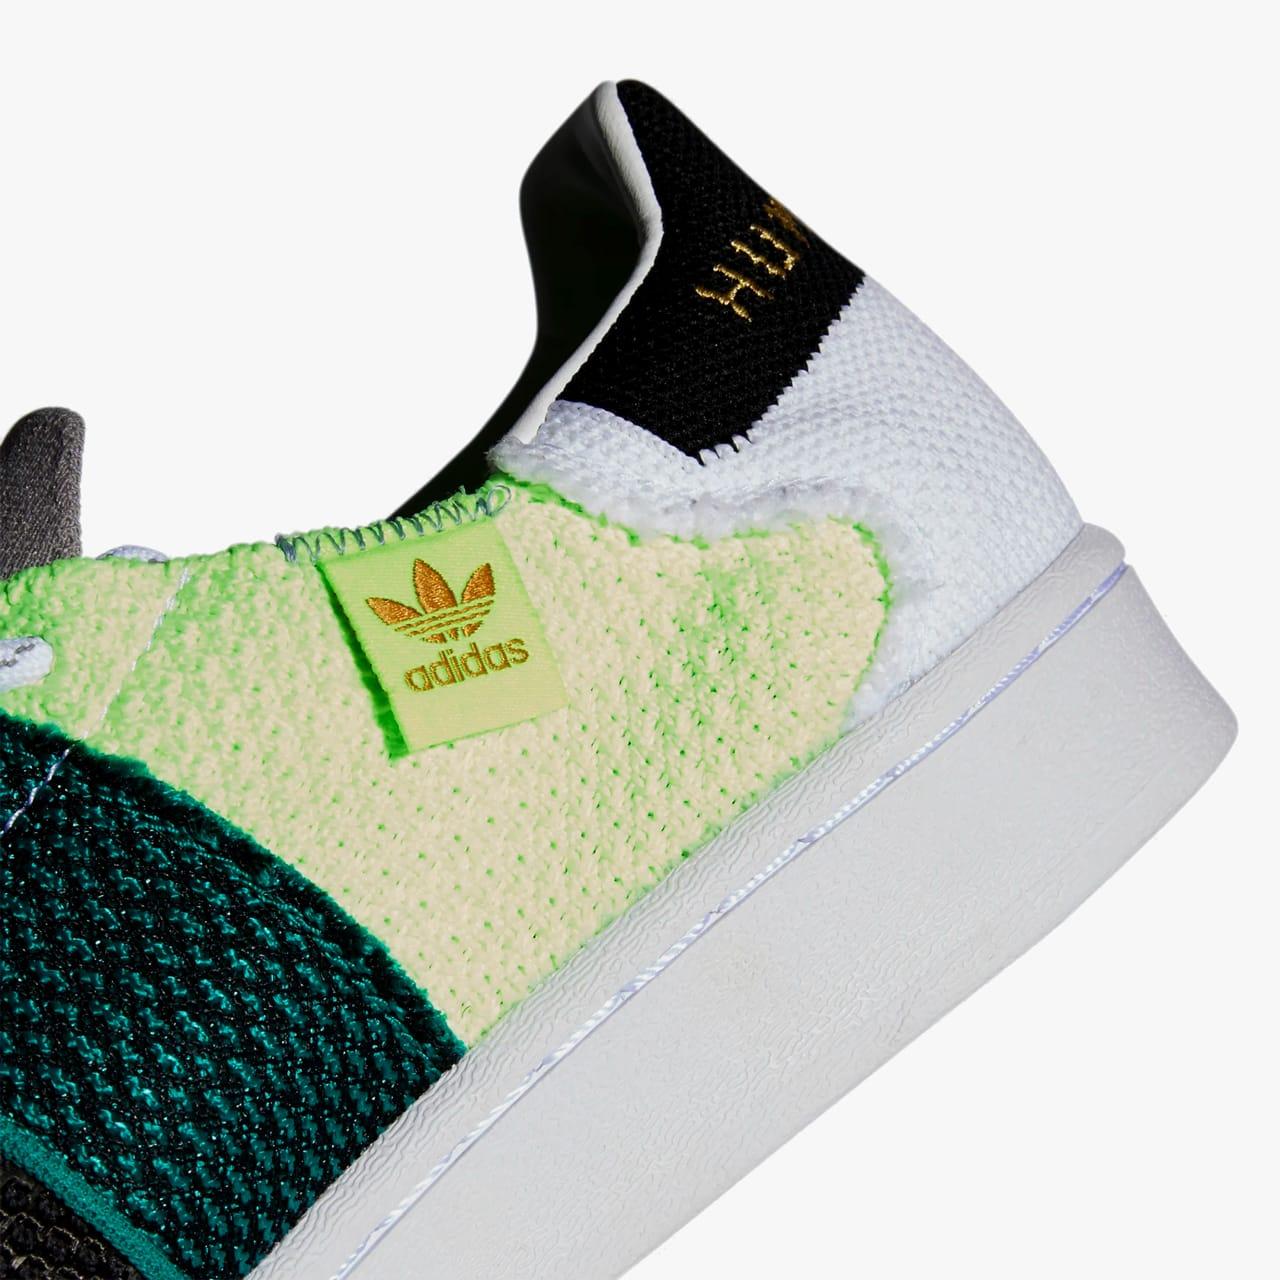 adidas superstar pharrell williams price